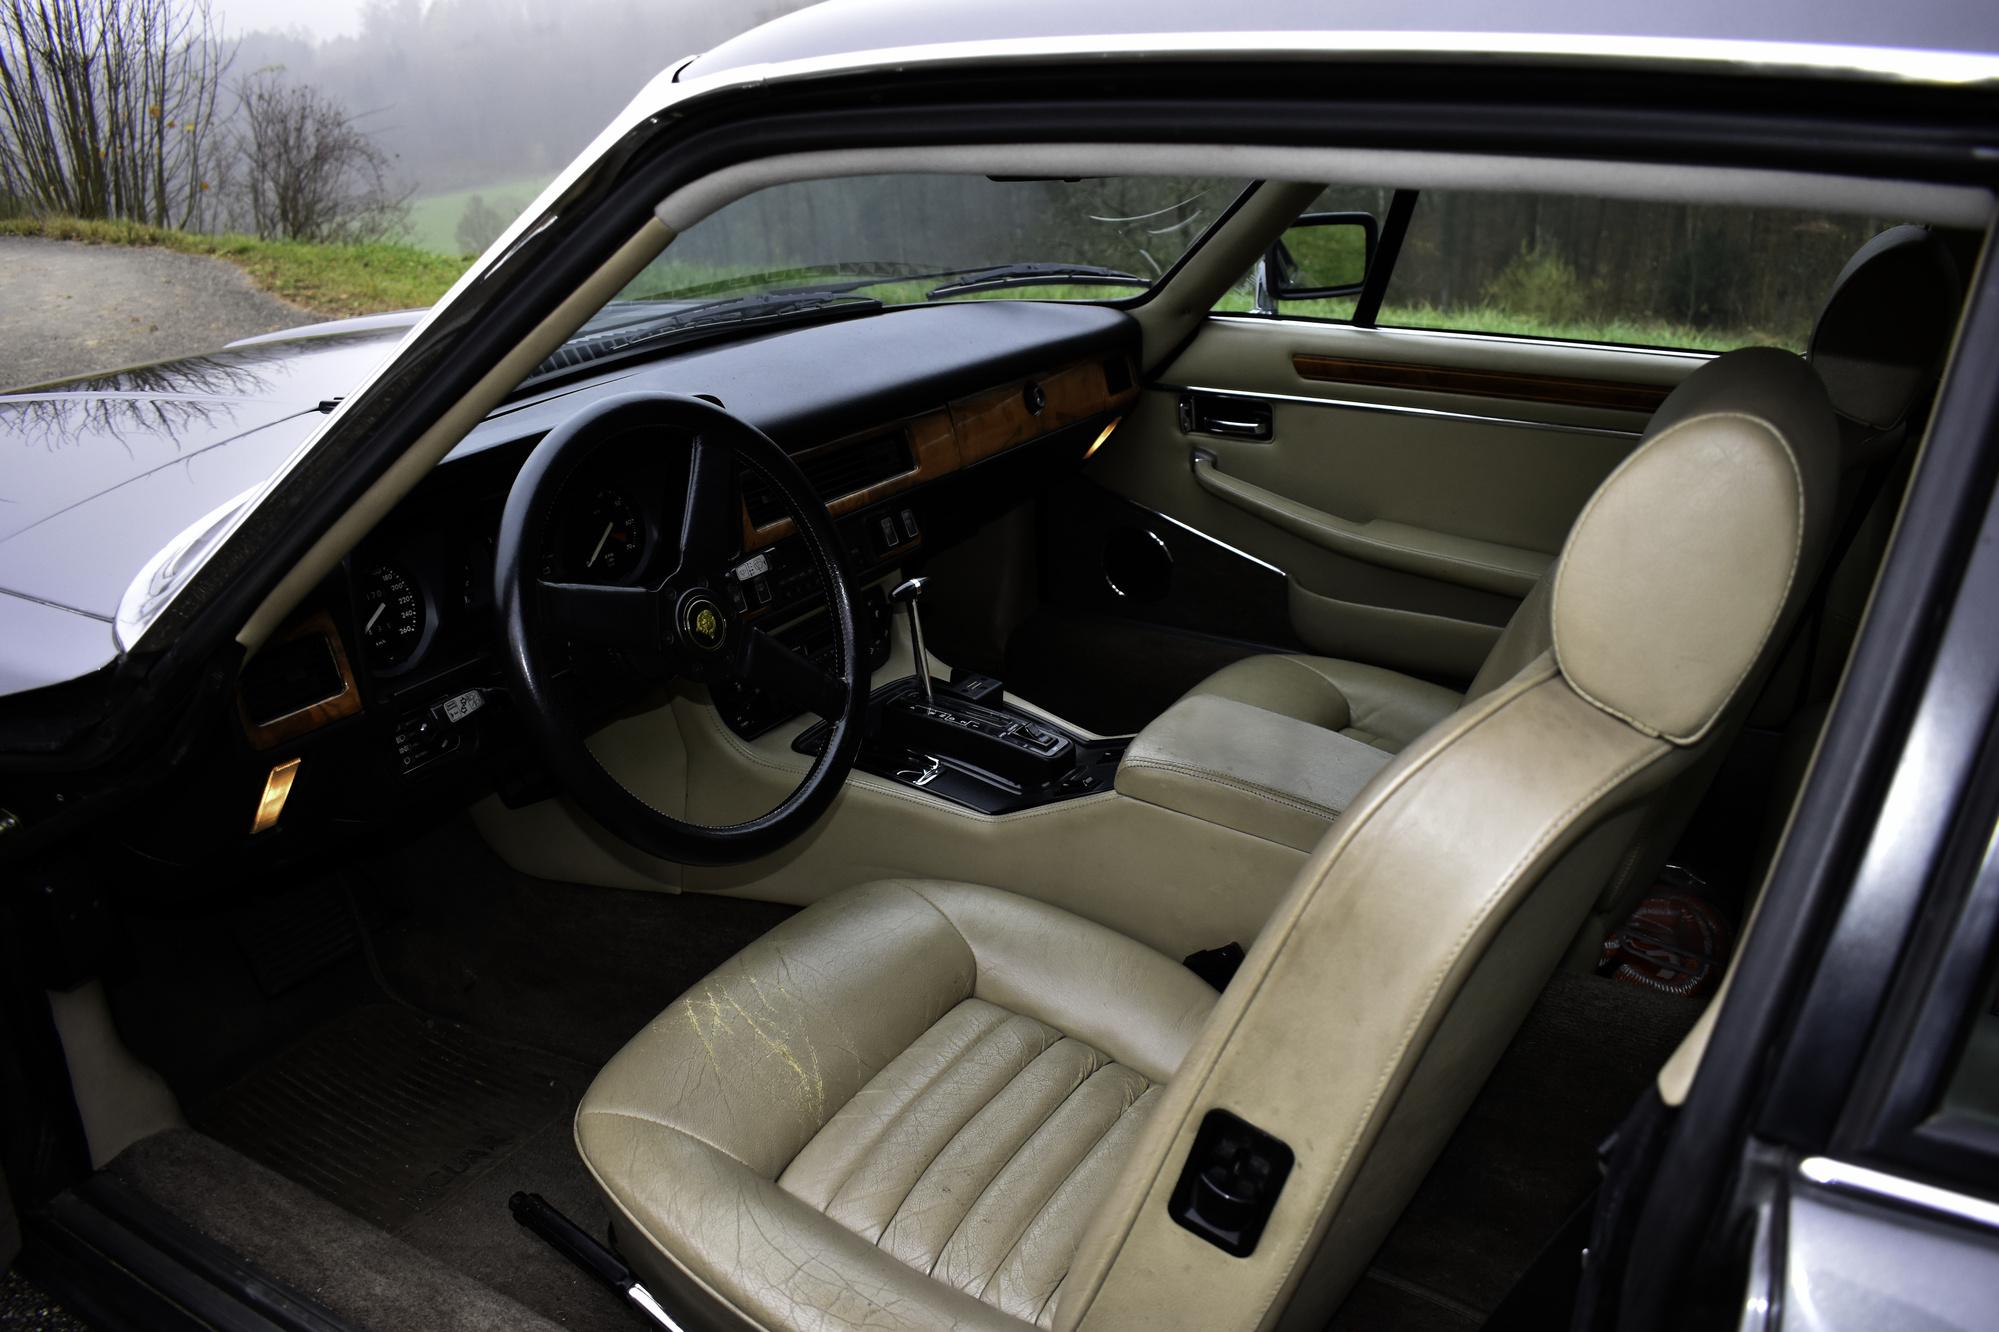 Grauer 1985 Jaguar XJS 5.3 V12 H.E. Coupe Oldtimer Veteranenfahrzeug mit Sicht ins Cockpit mit offener Fahrertüre